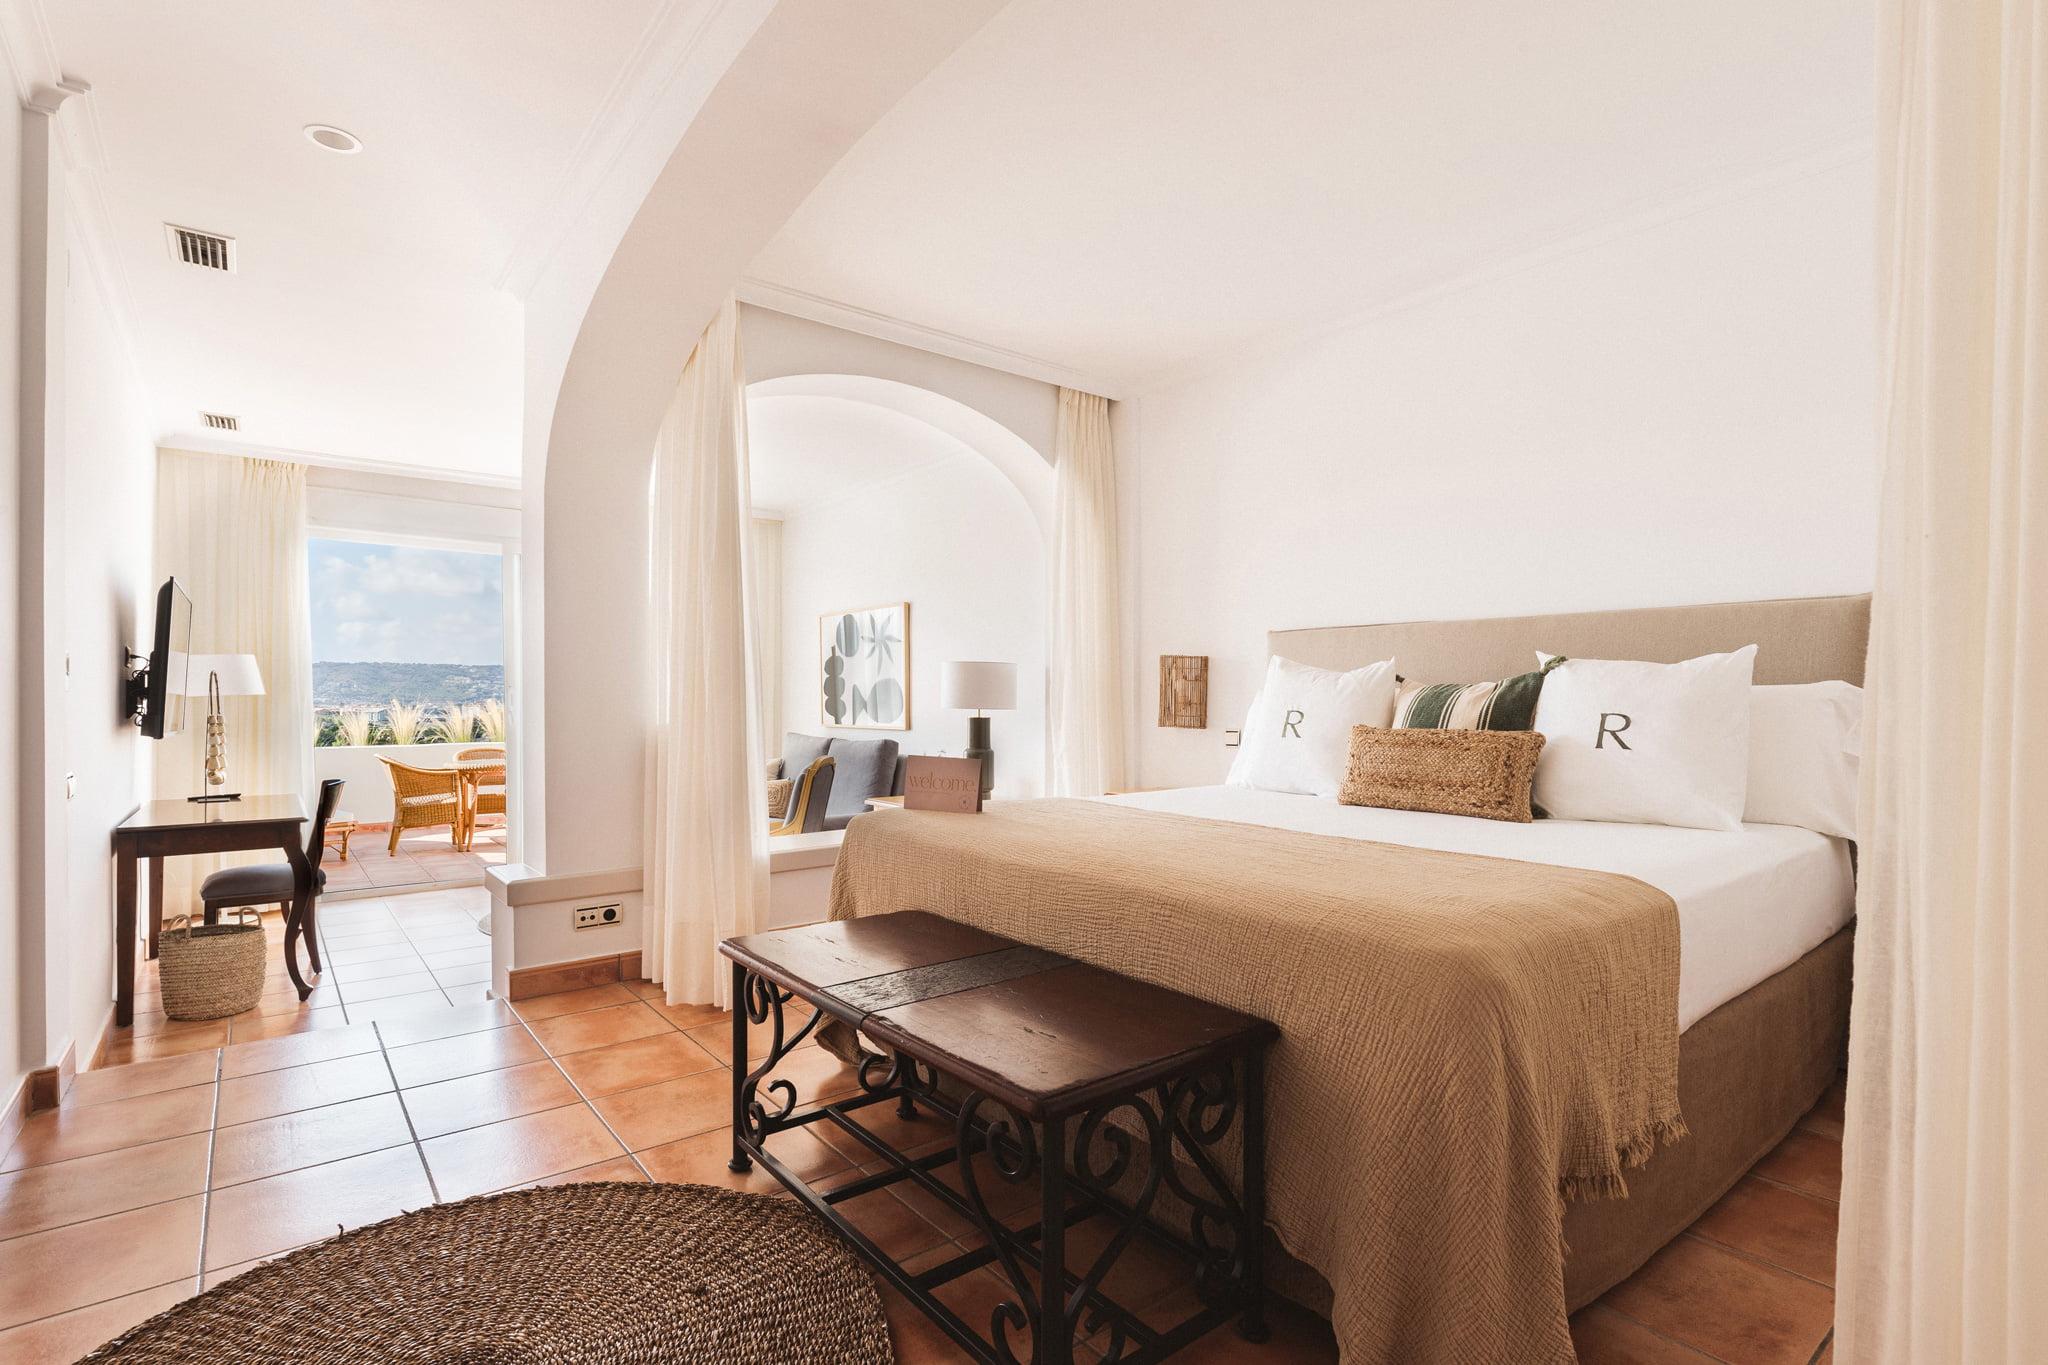 Mejor hotel en Javea – Hotel Ritual de Terra Resort & Spa